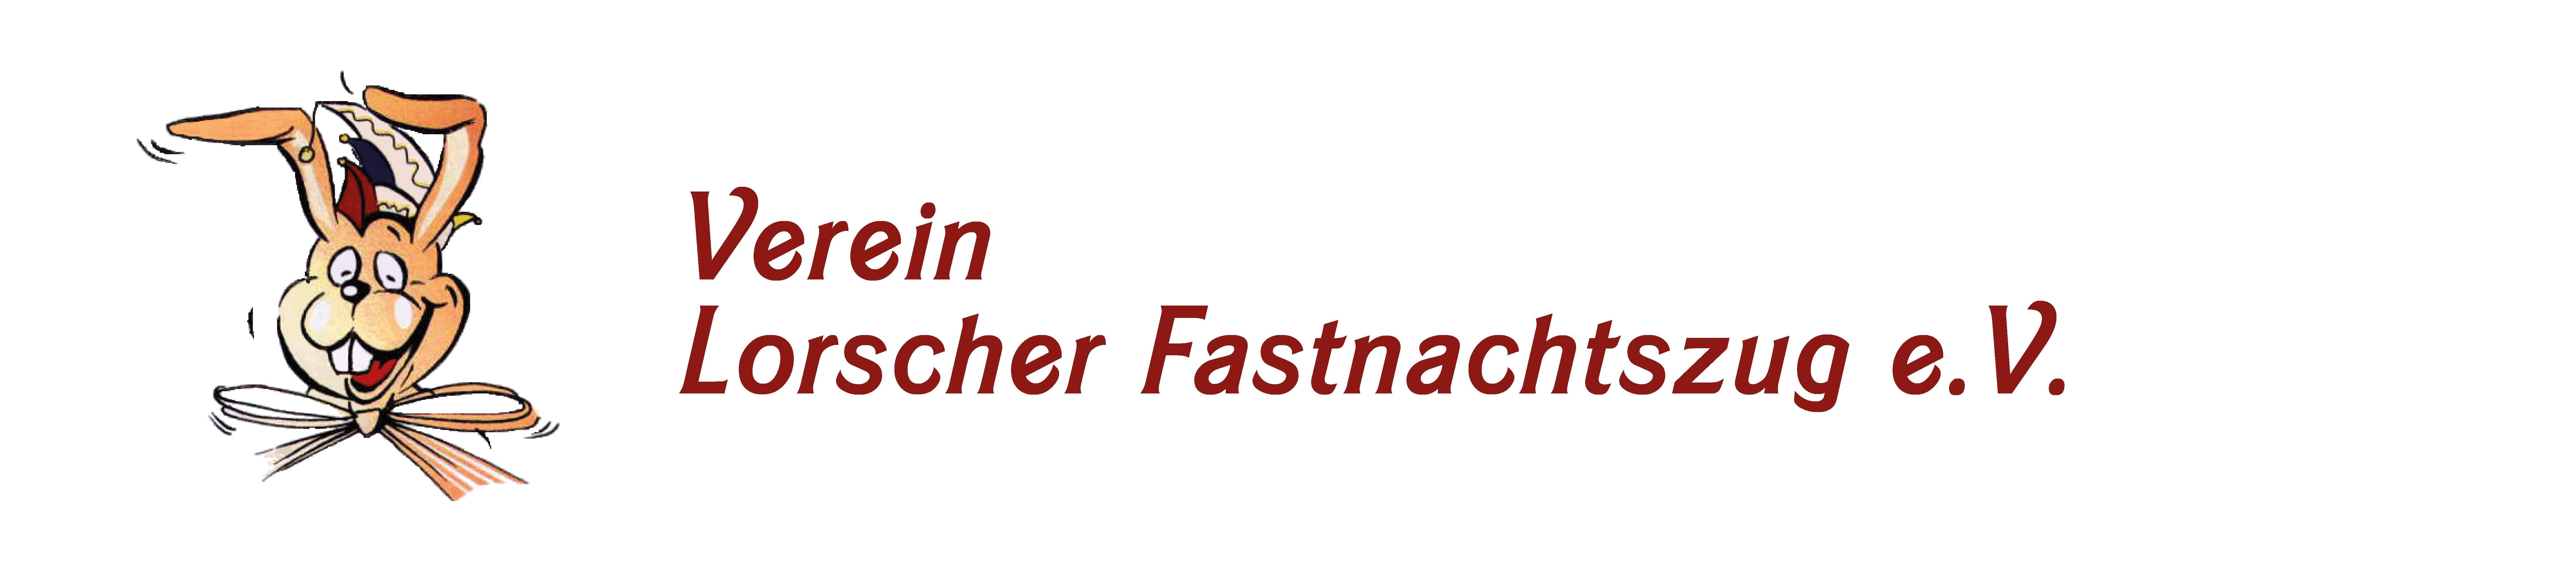 Verein Lorscher Fastnachtszug e.V.